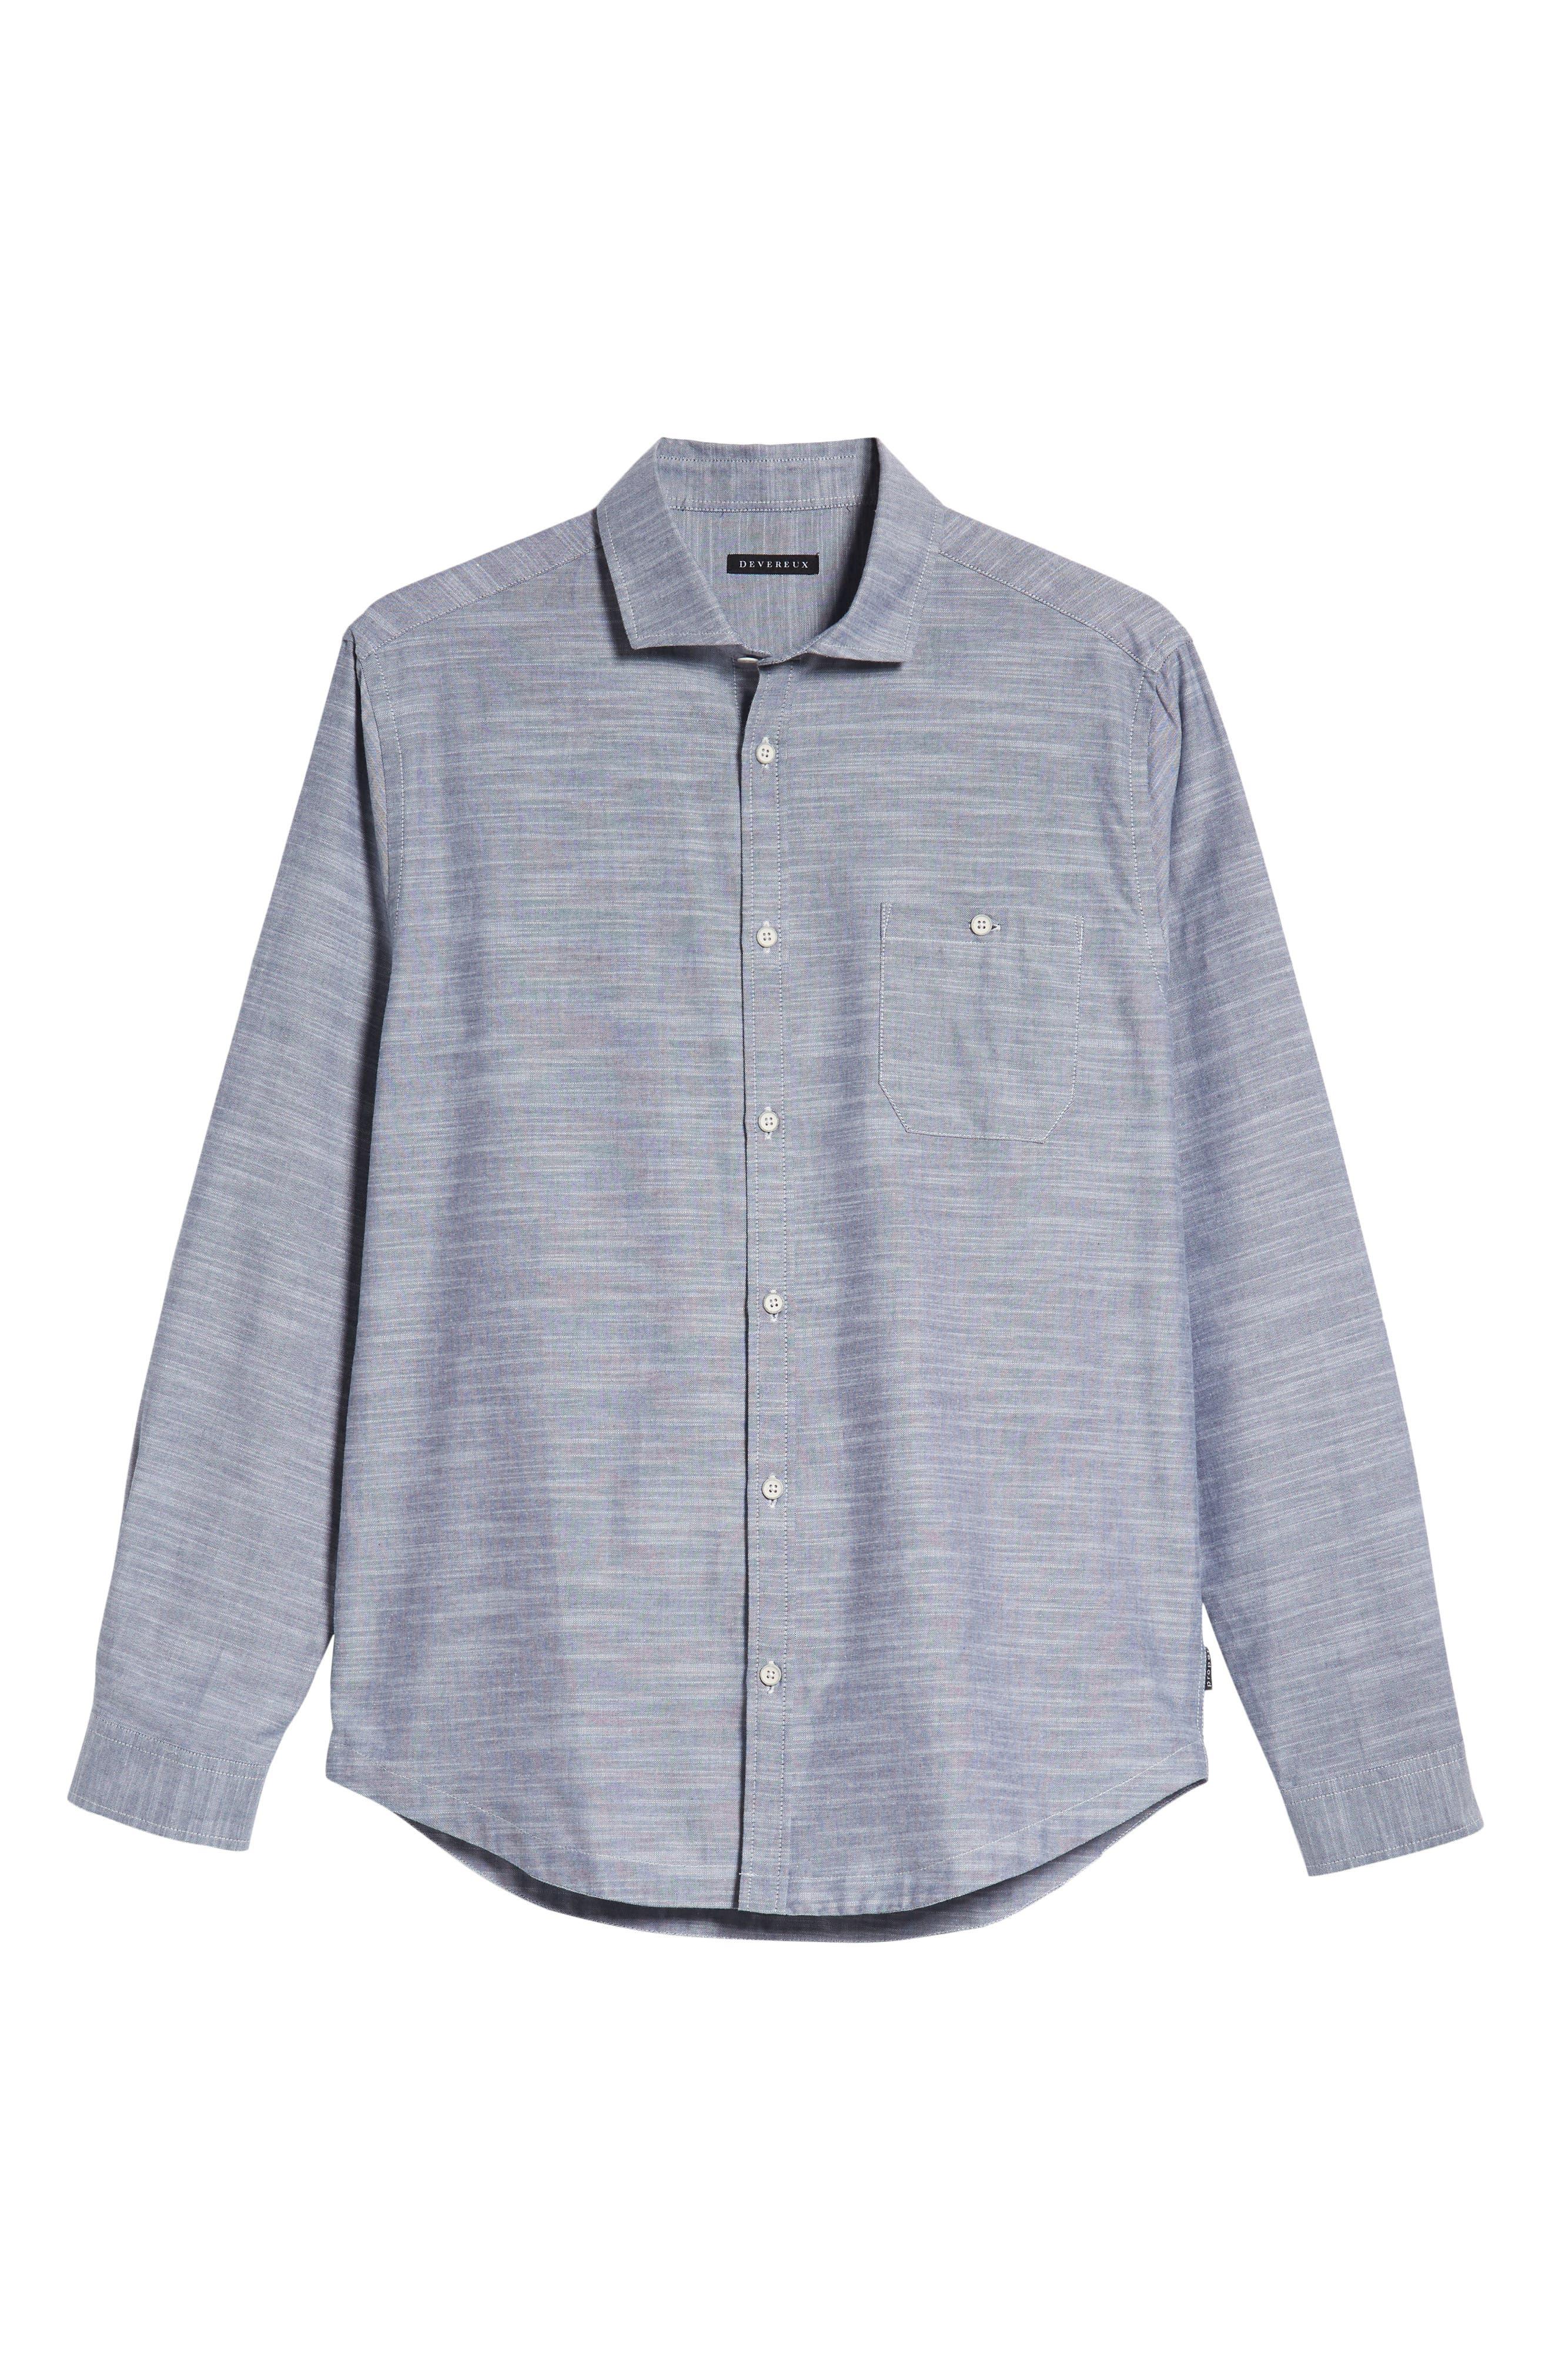 Rugger Regular Fit Sport Shirt,                             Alternate thumbnail 5, color,                             029